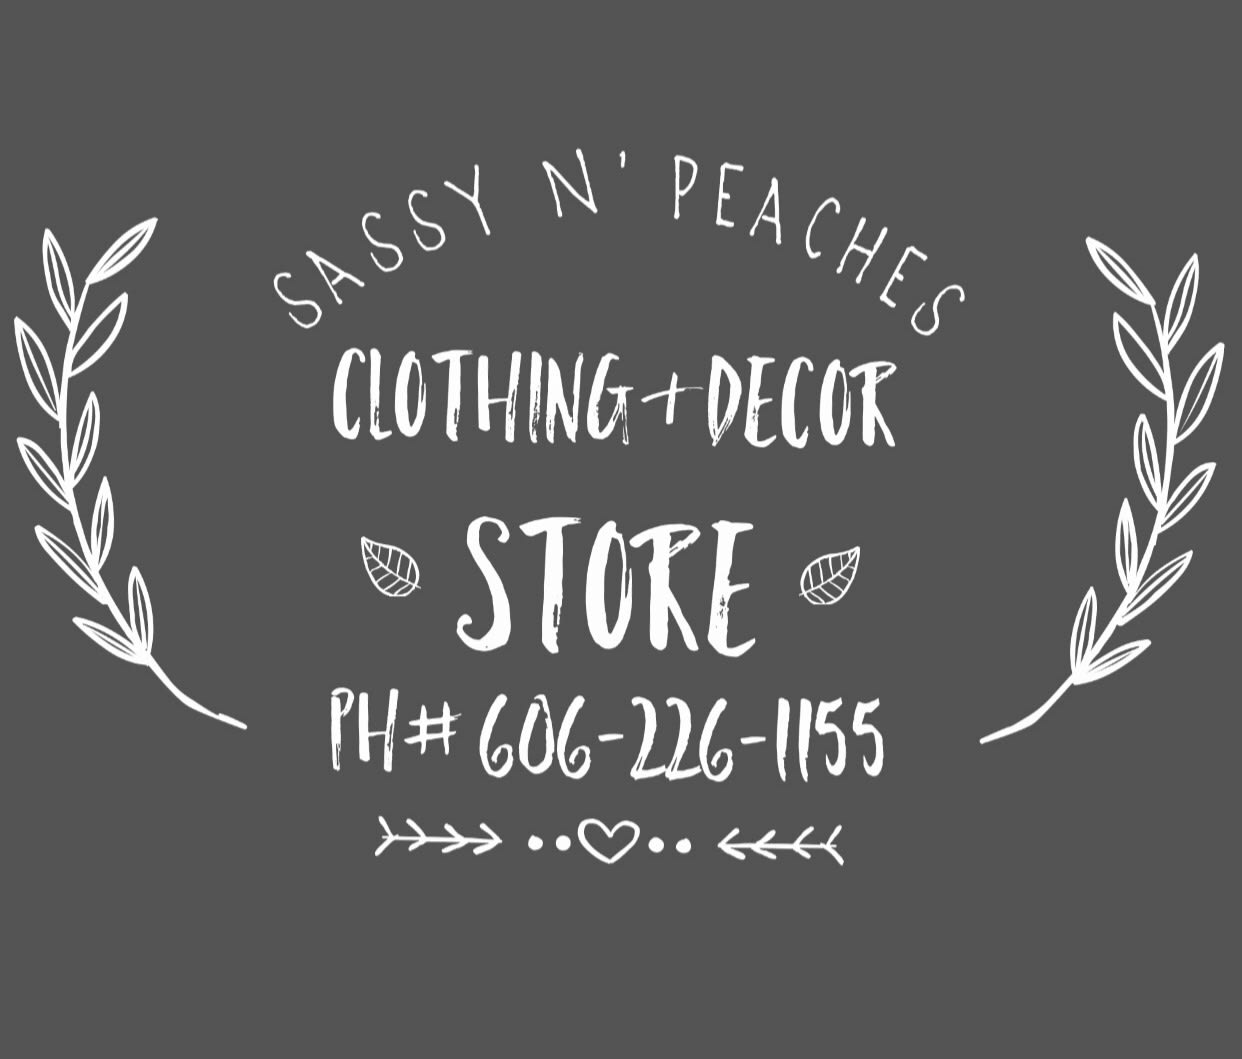 Sassy N' Peaches Clothing & Decor Store